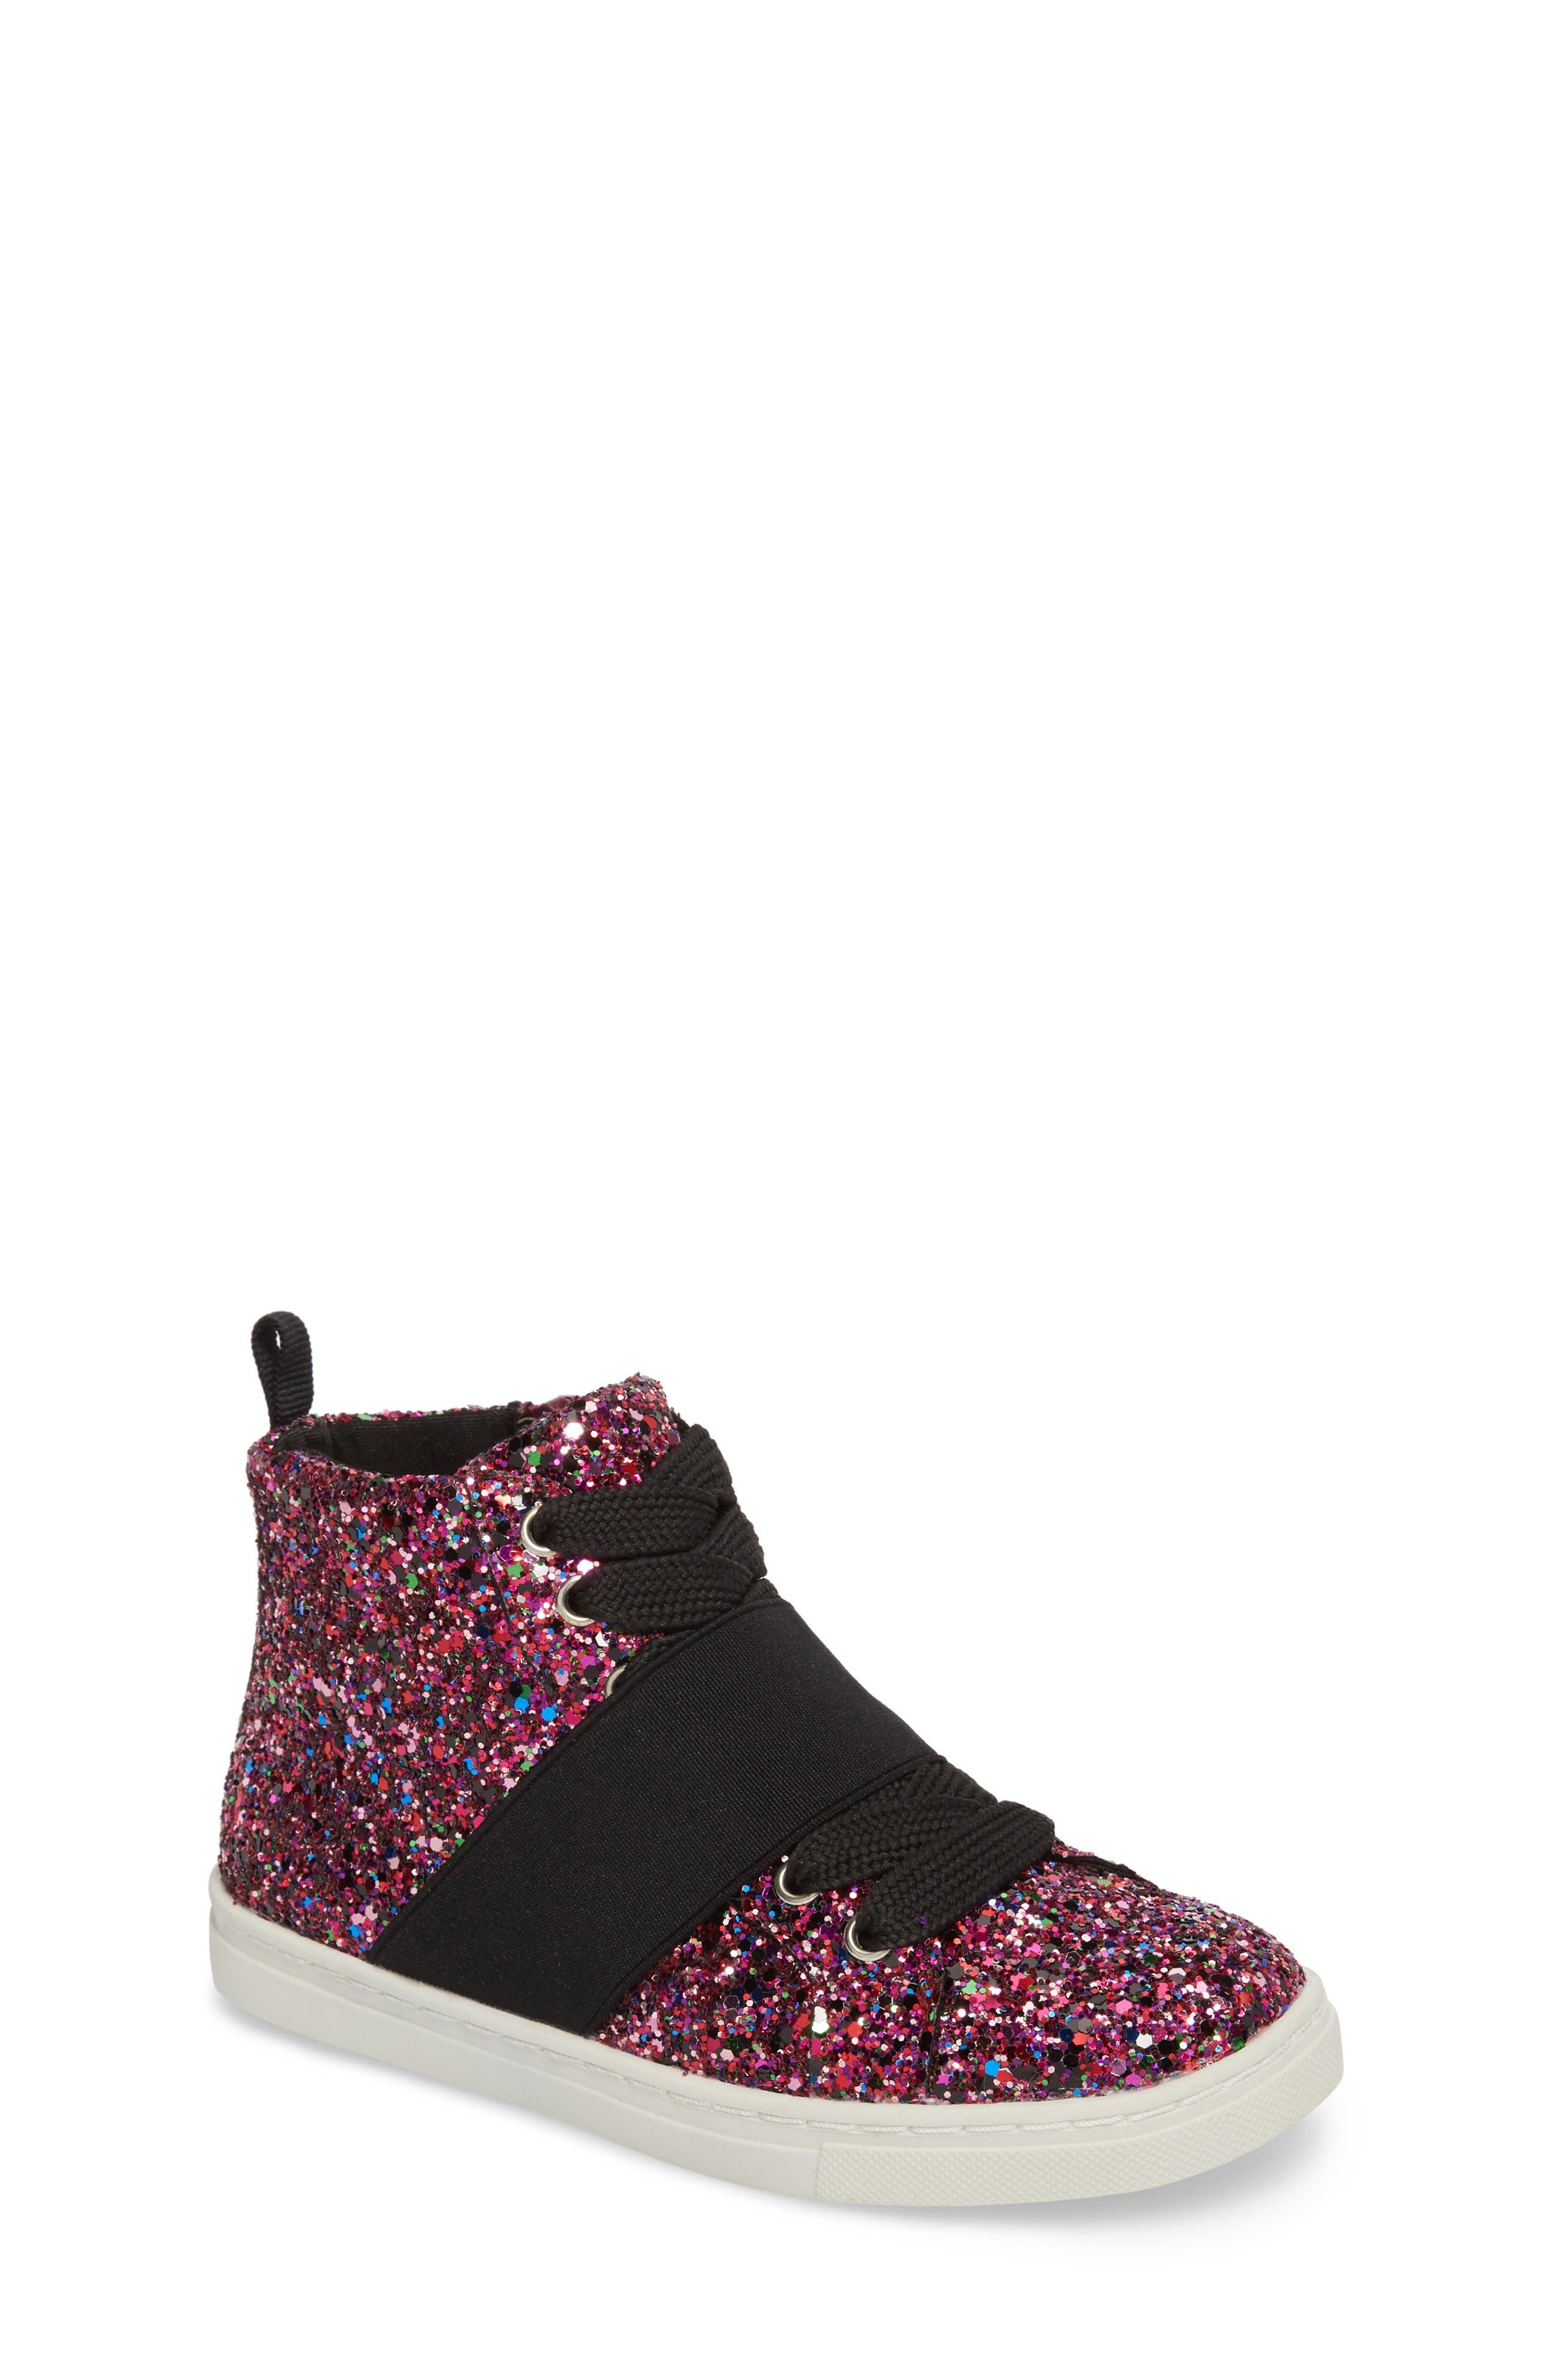 Zoa High Top Sneaker,                             Main thumbnail 1, color,                             650